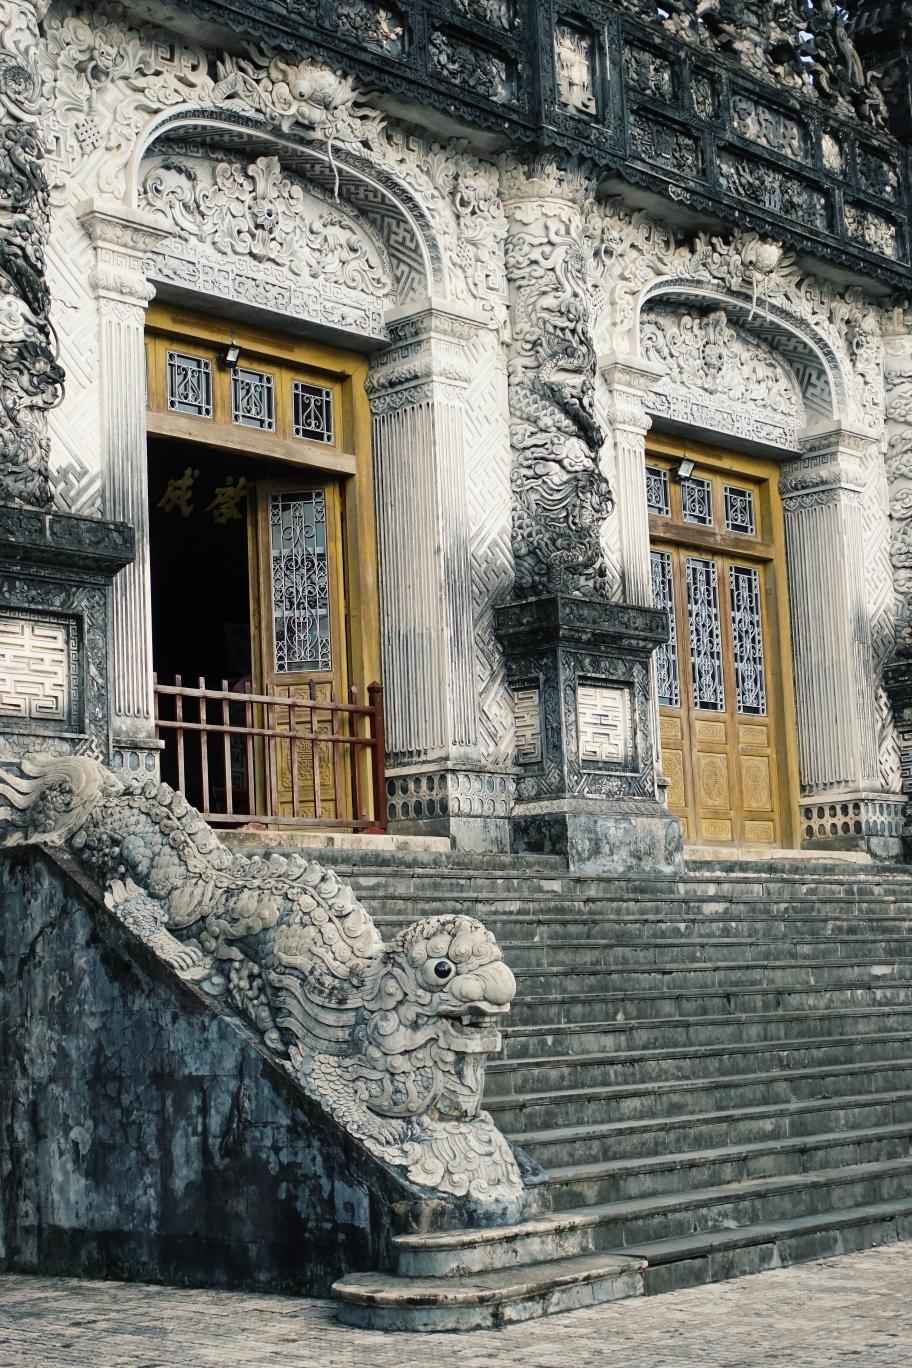 Hue: Tombs